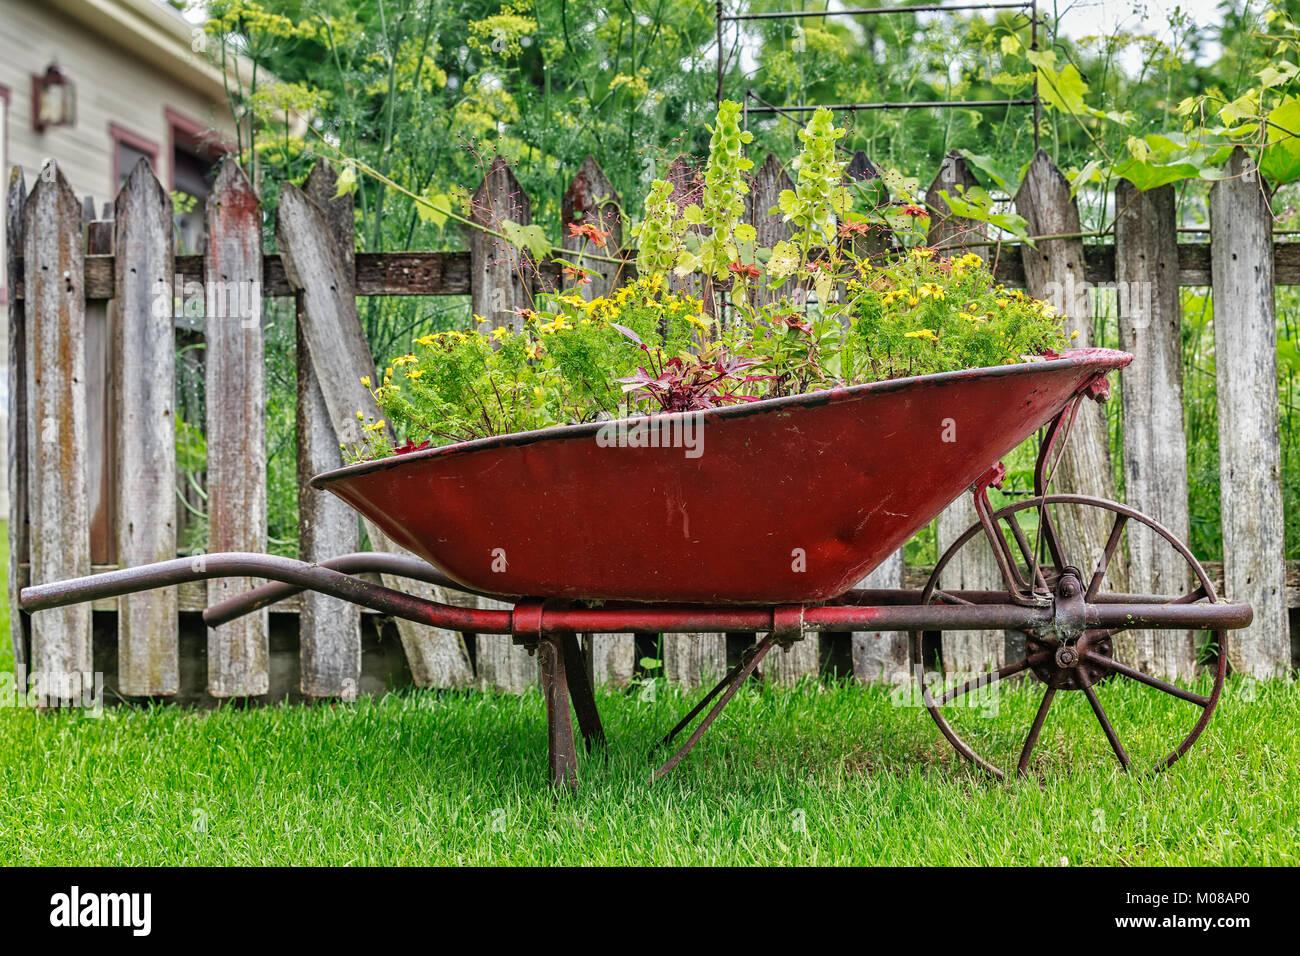 Wheelbarrow full of flowers, Manitoba, Canada. - Stock Image